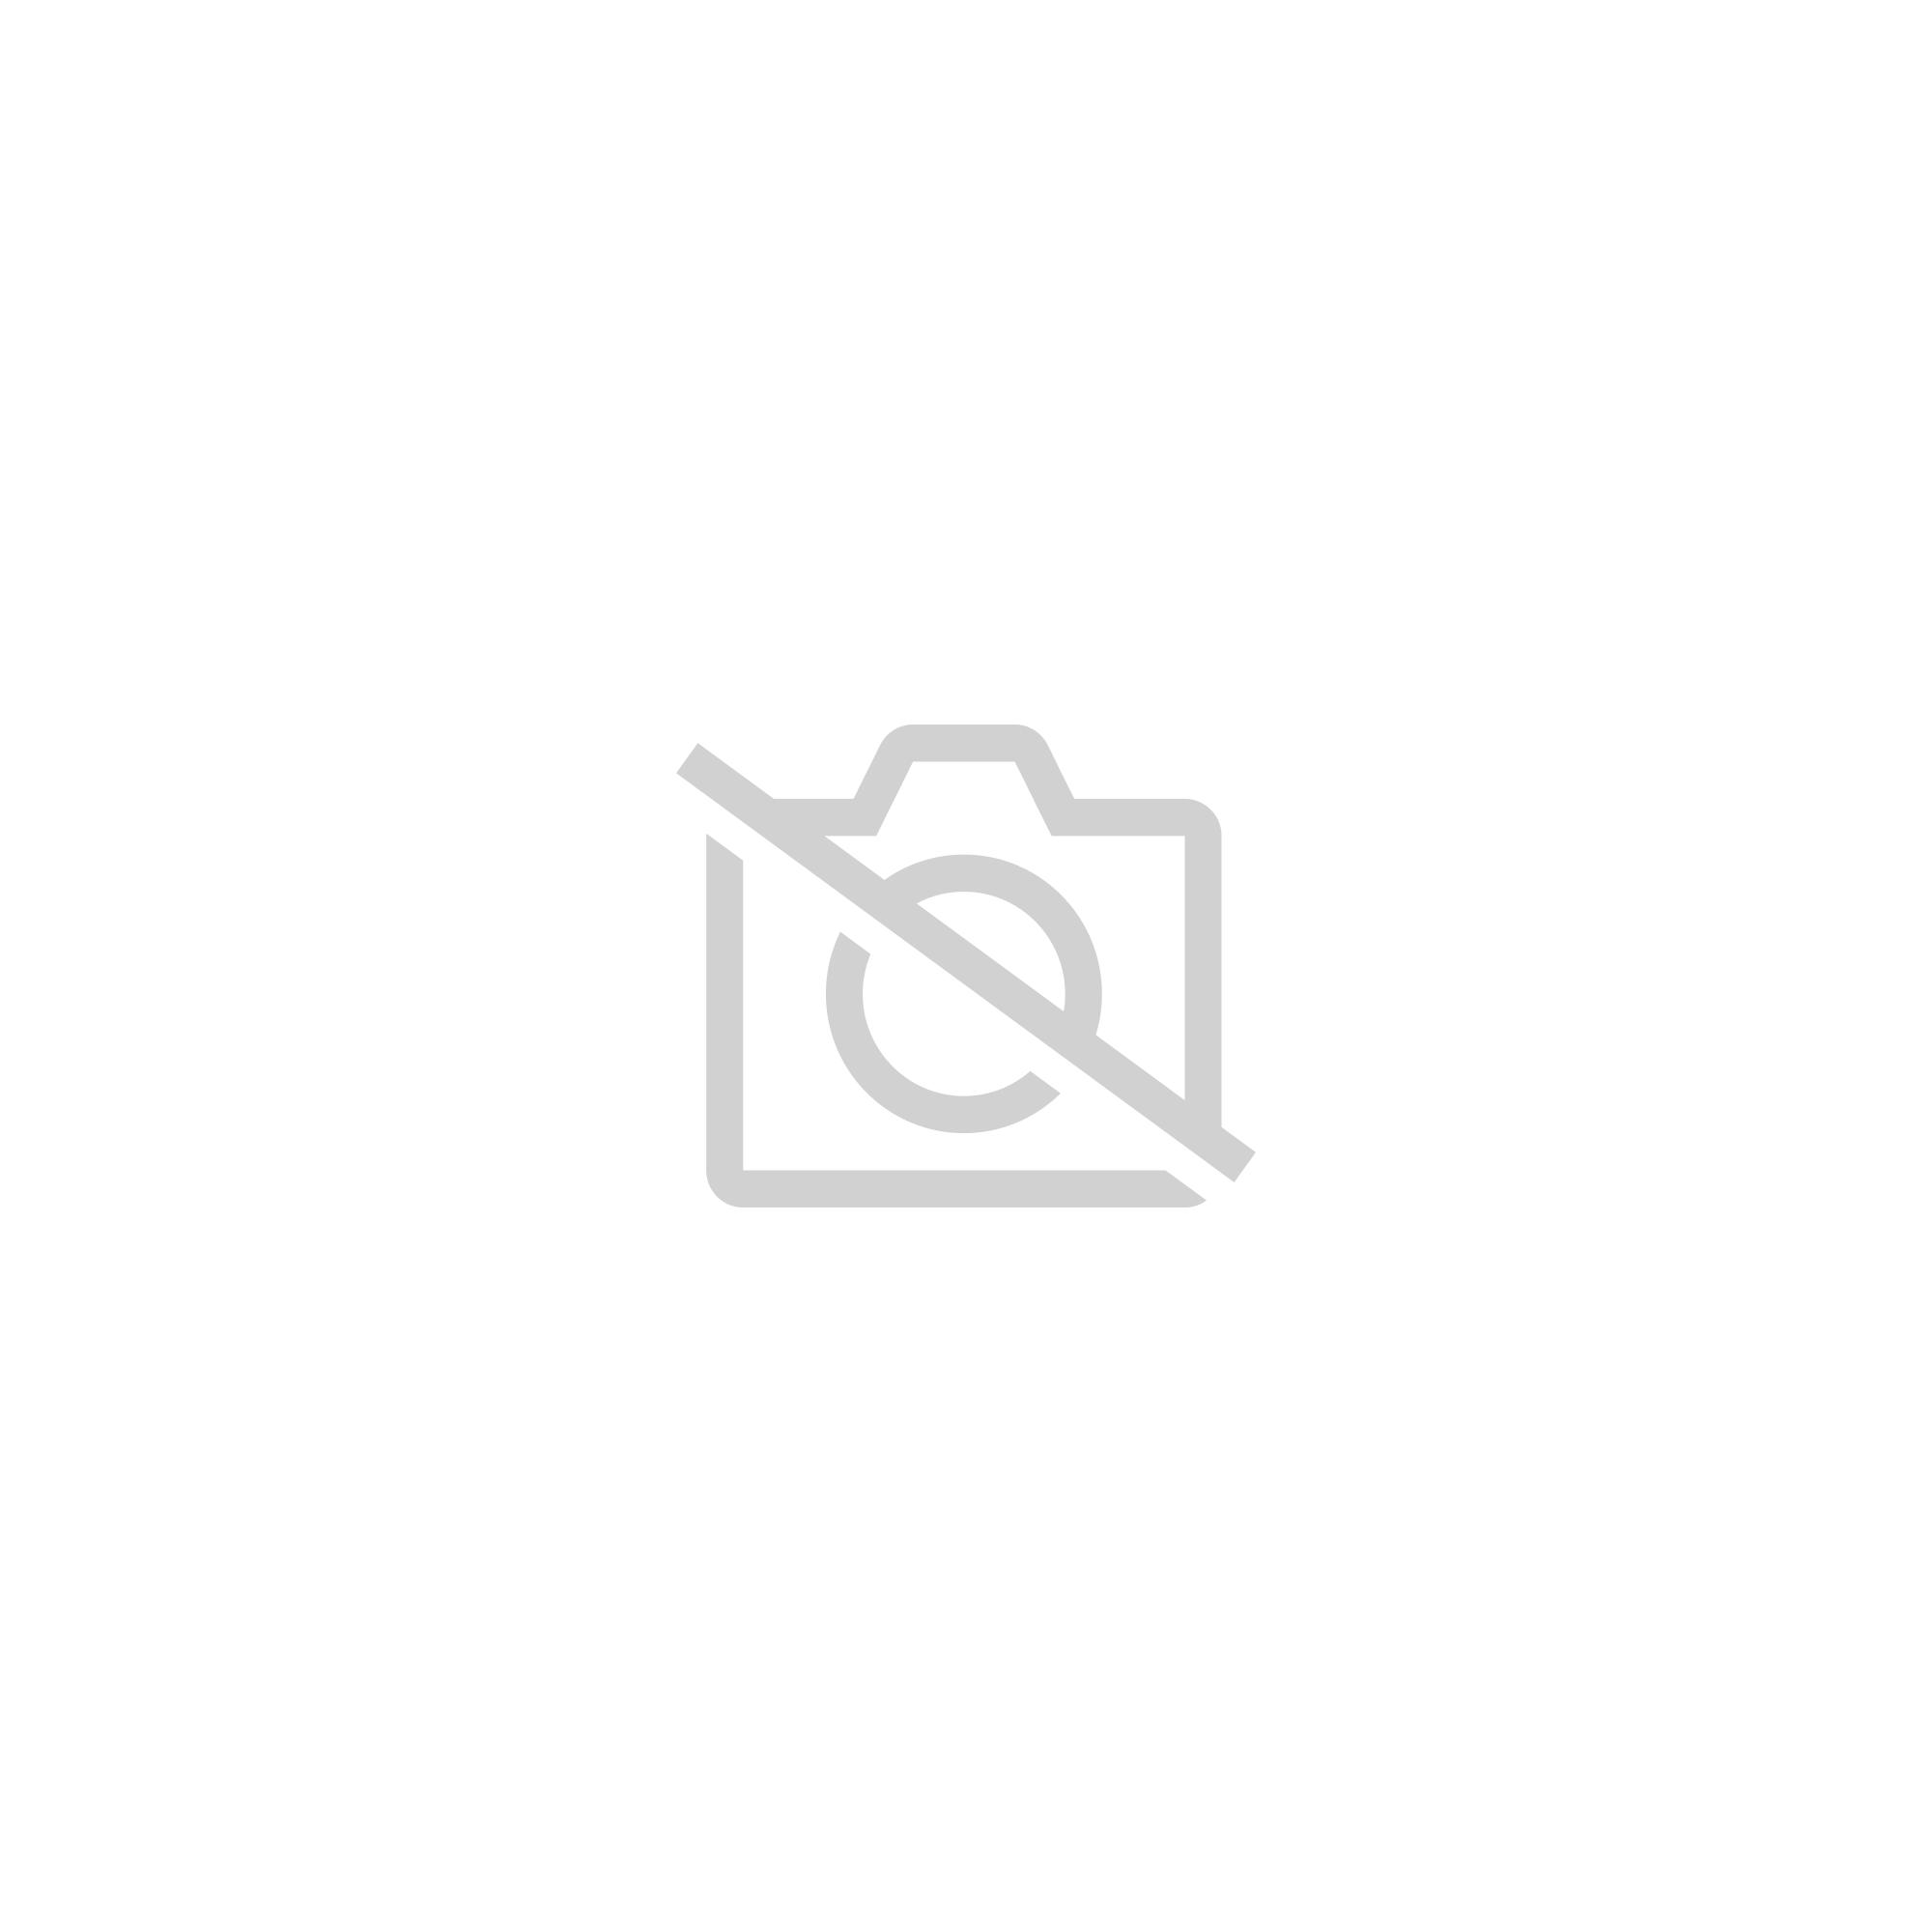 Nike Maillot Manches Longues Park Vi Bleu Marine